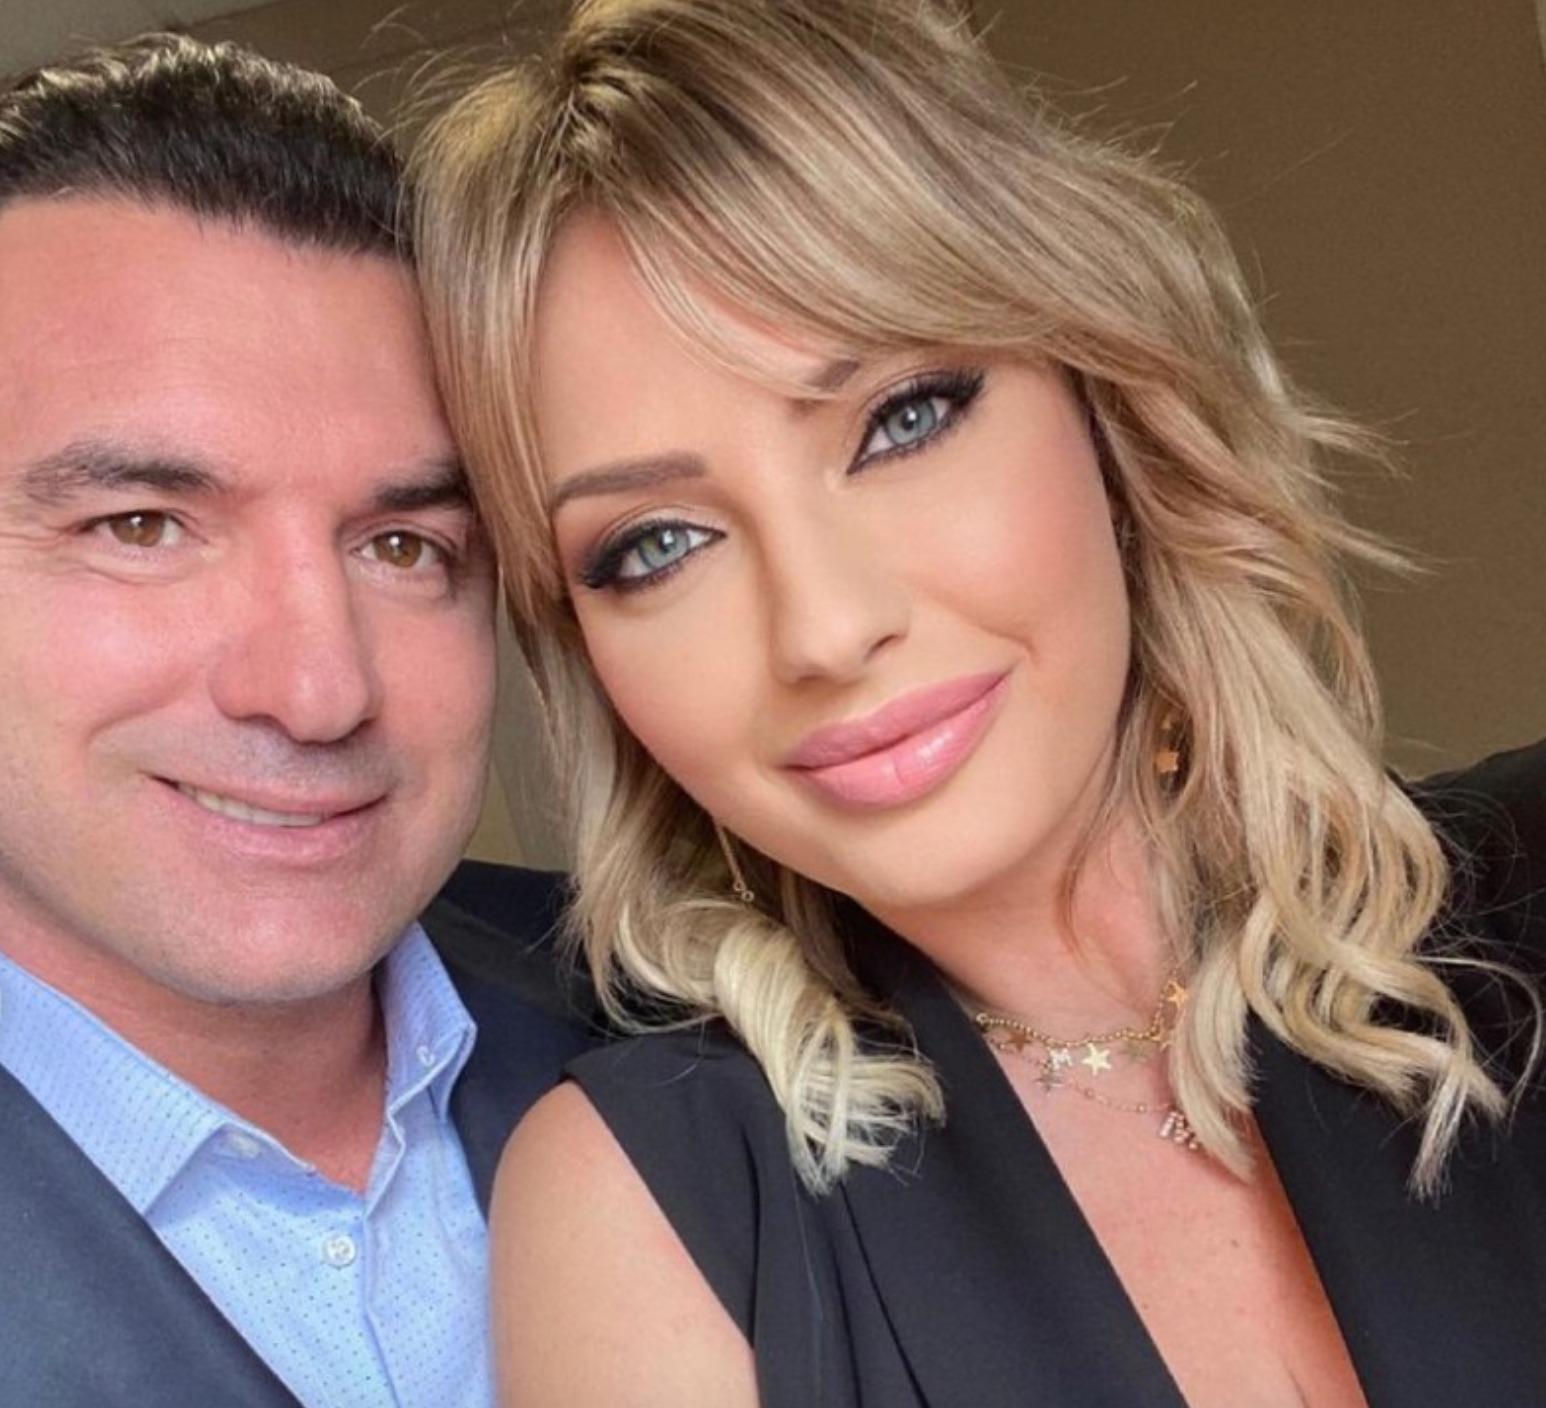 manila nazzaro matrimonio lorenzo amoruso divorzio